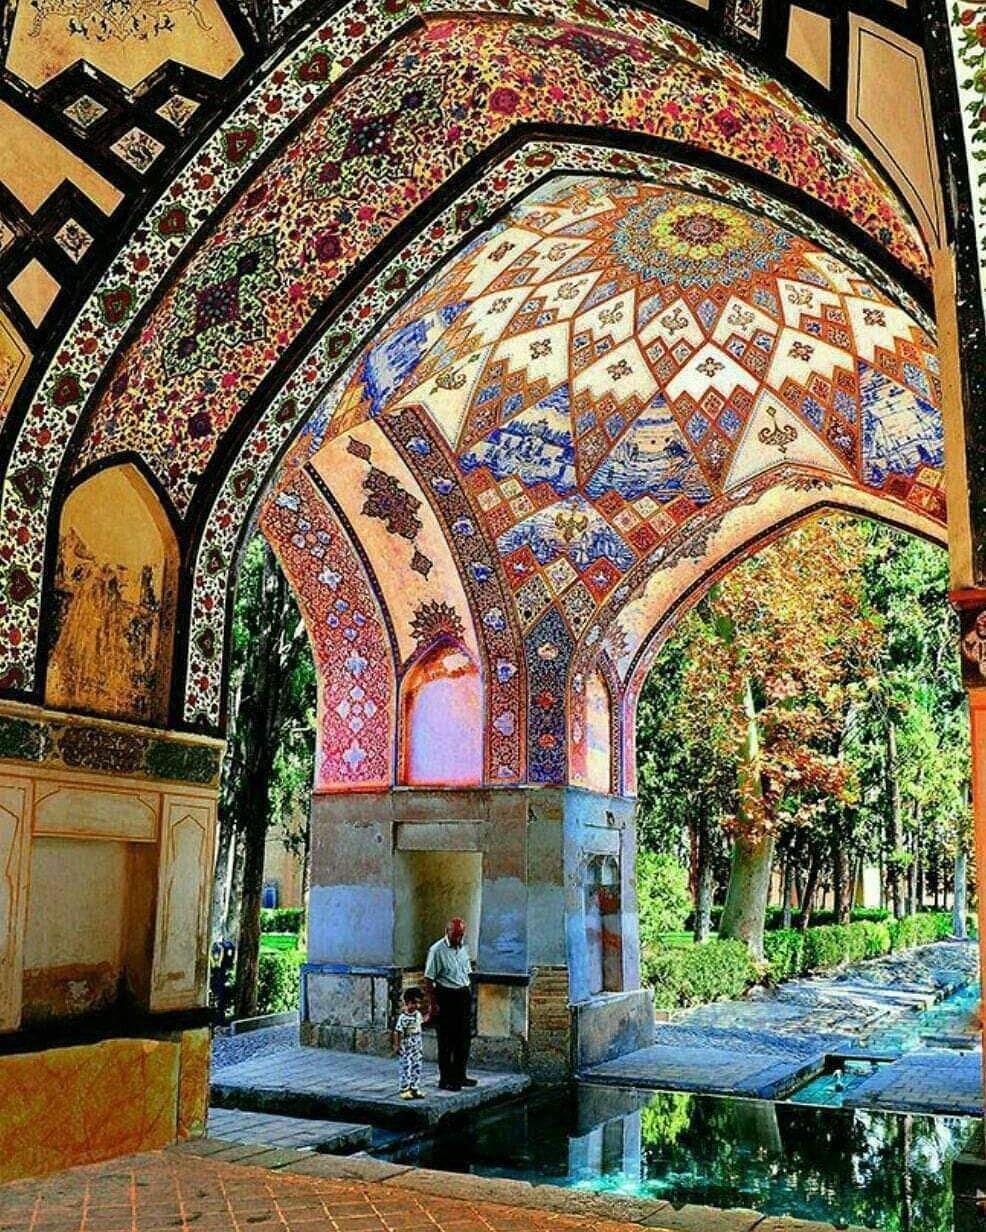 Day 2: Tehran-Kashan